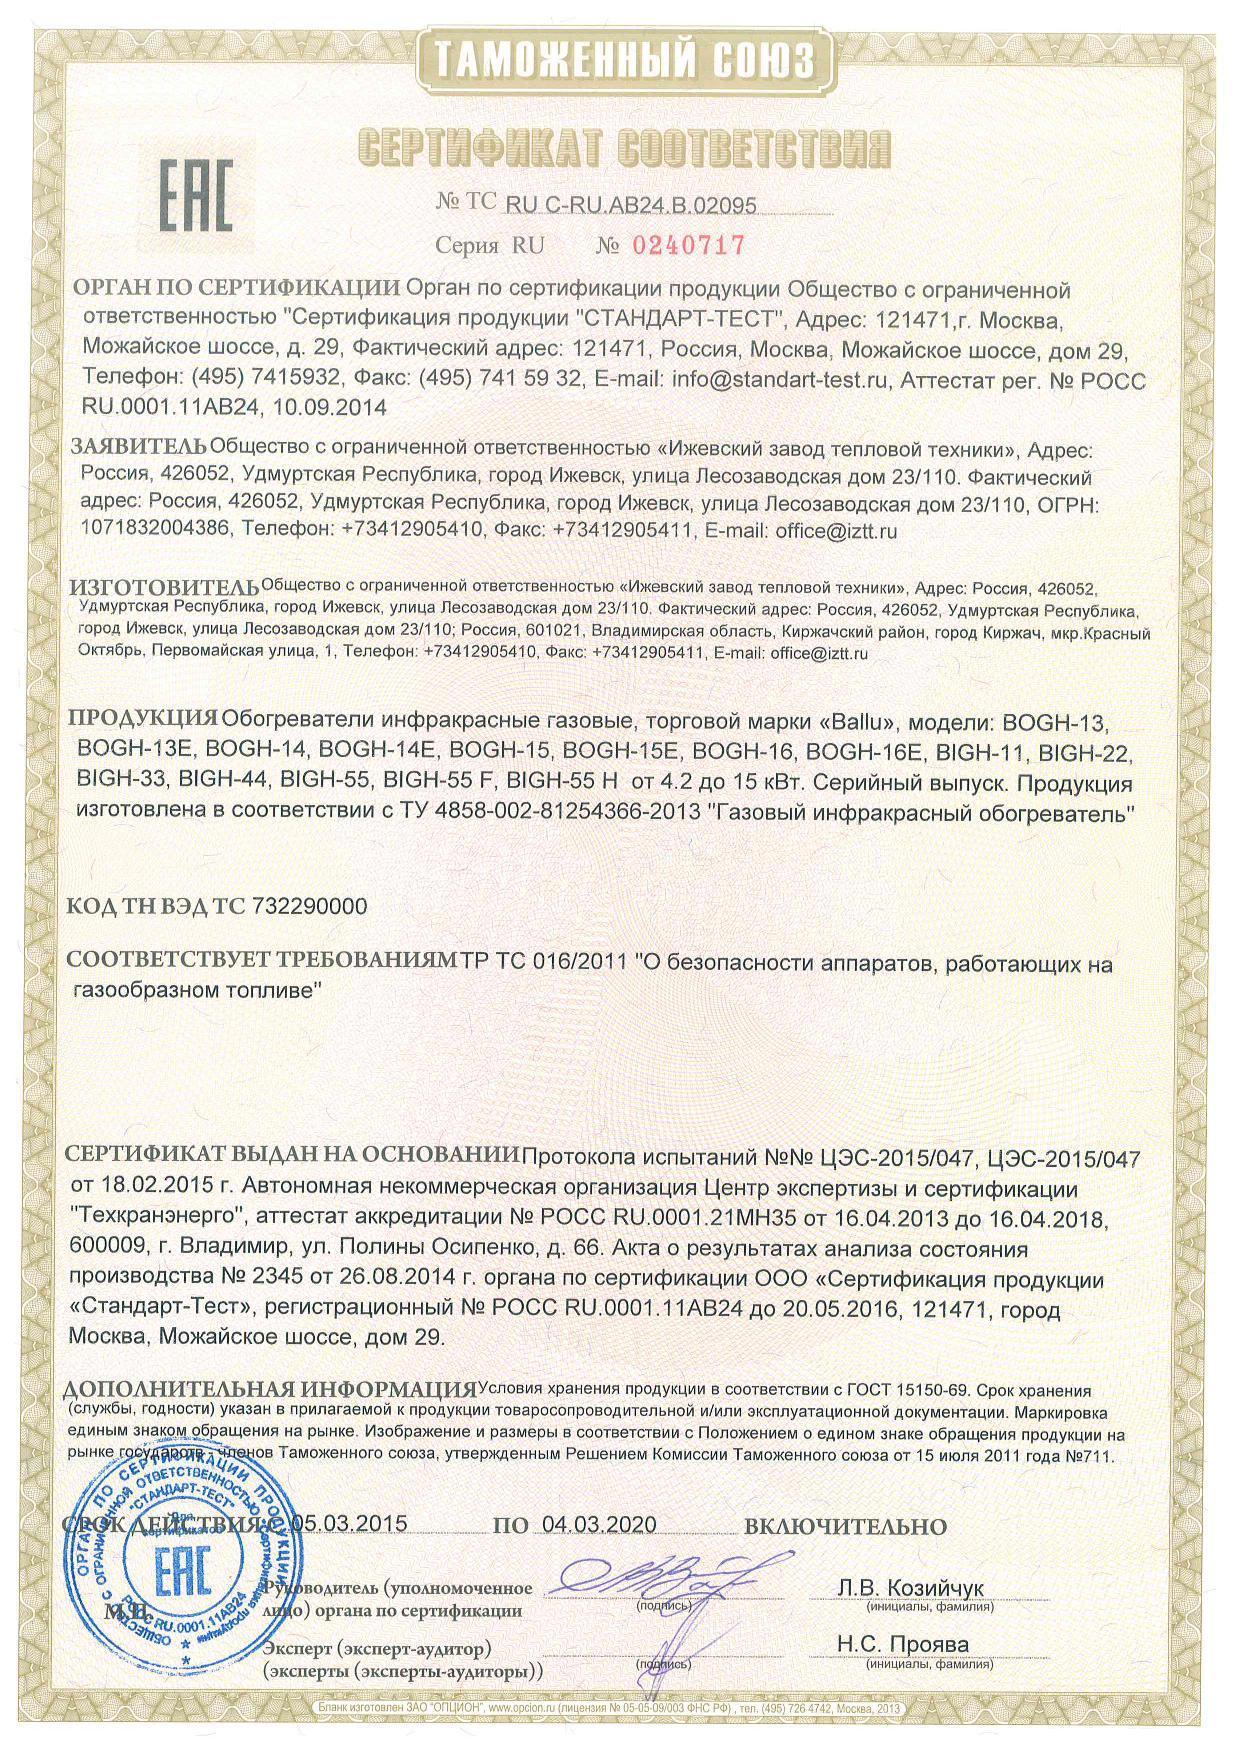 Сертификат соответствия на Ballu BIGH-55